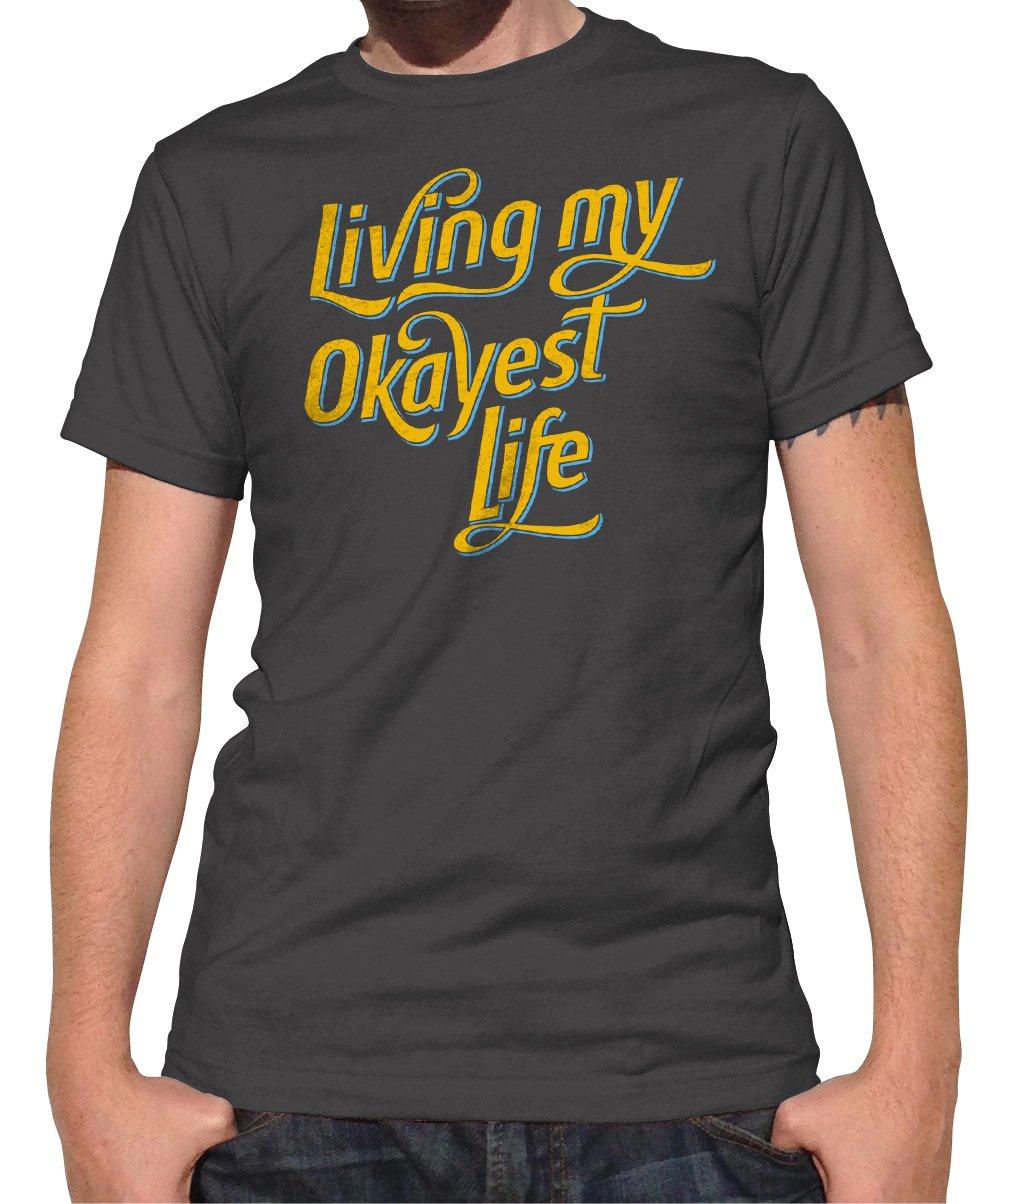 b02a567c5 Men's Living My Okayest Life T-Shirt | Shirts I Want | Drinking ...